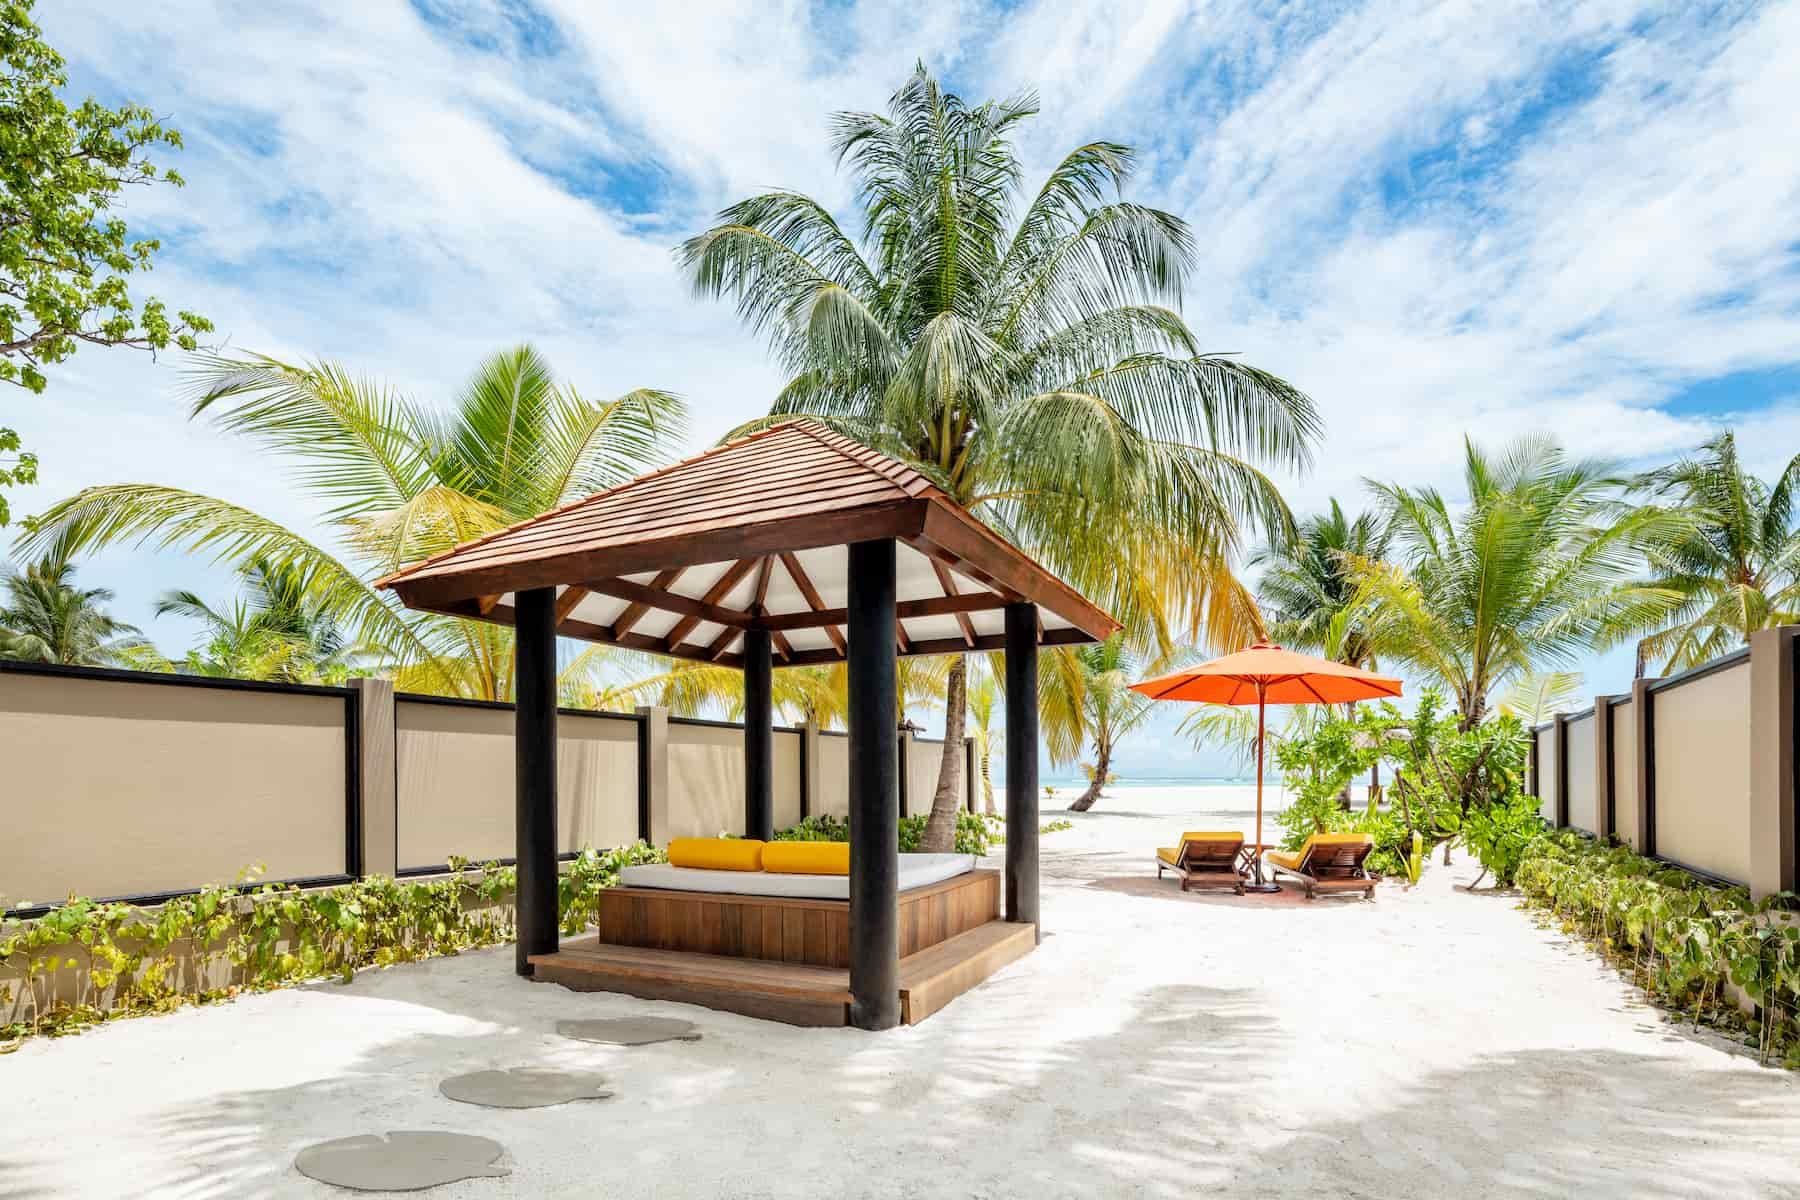 Angsana Velavaru resort Maldive deluxe beachfront pool villaAngsana Velavaru resort Maldive deluxe beachfront pool villa